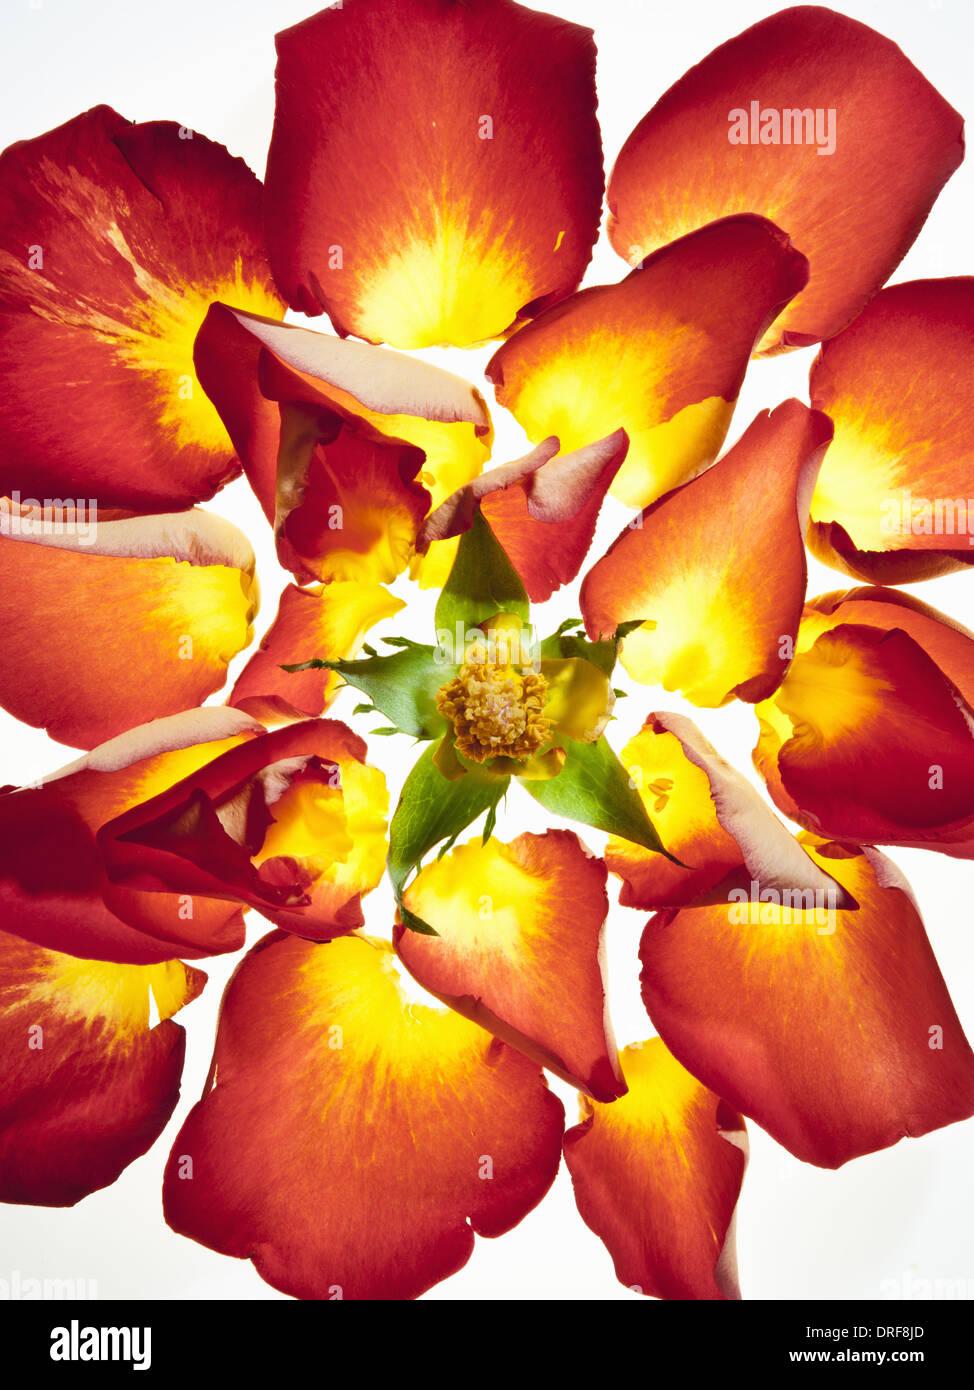 Maryland USA flowerhead con vivido arancione e petali gialli Immagini Stock